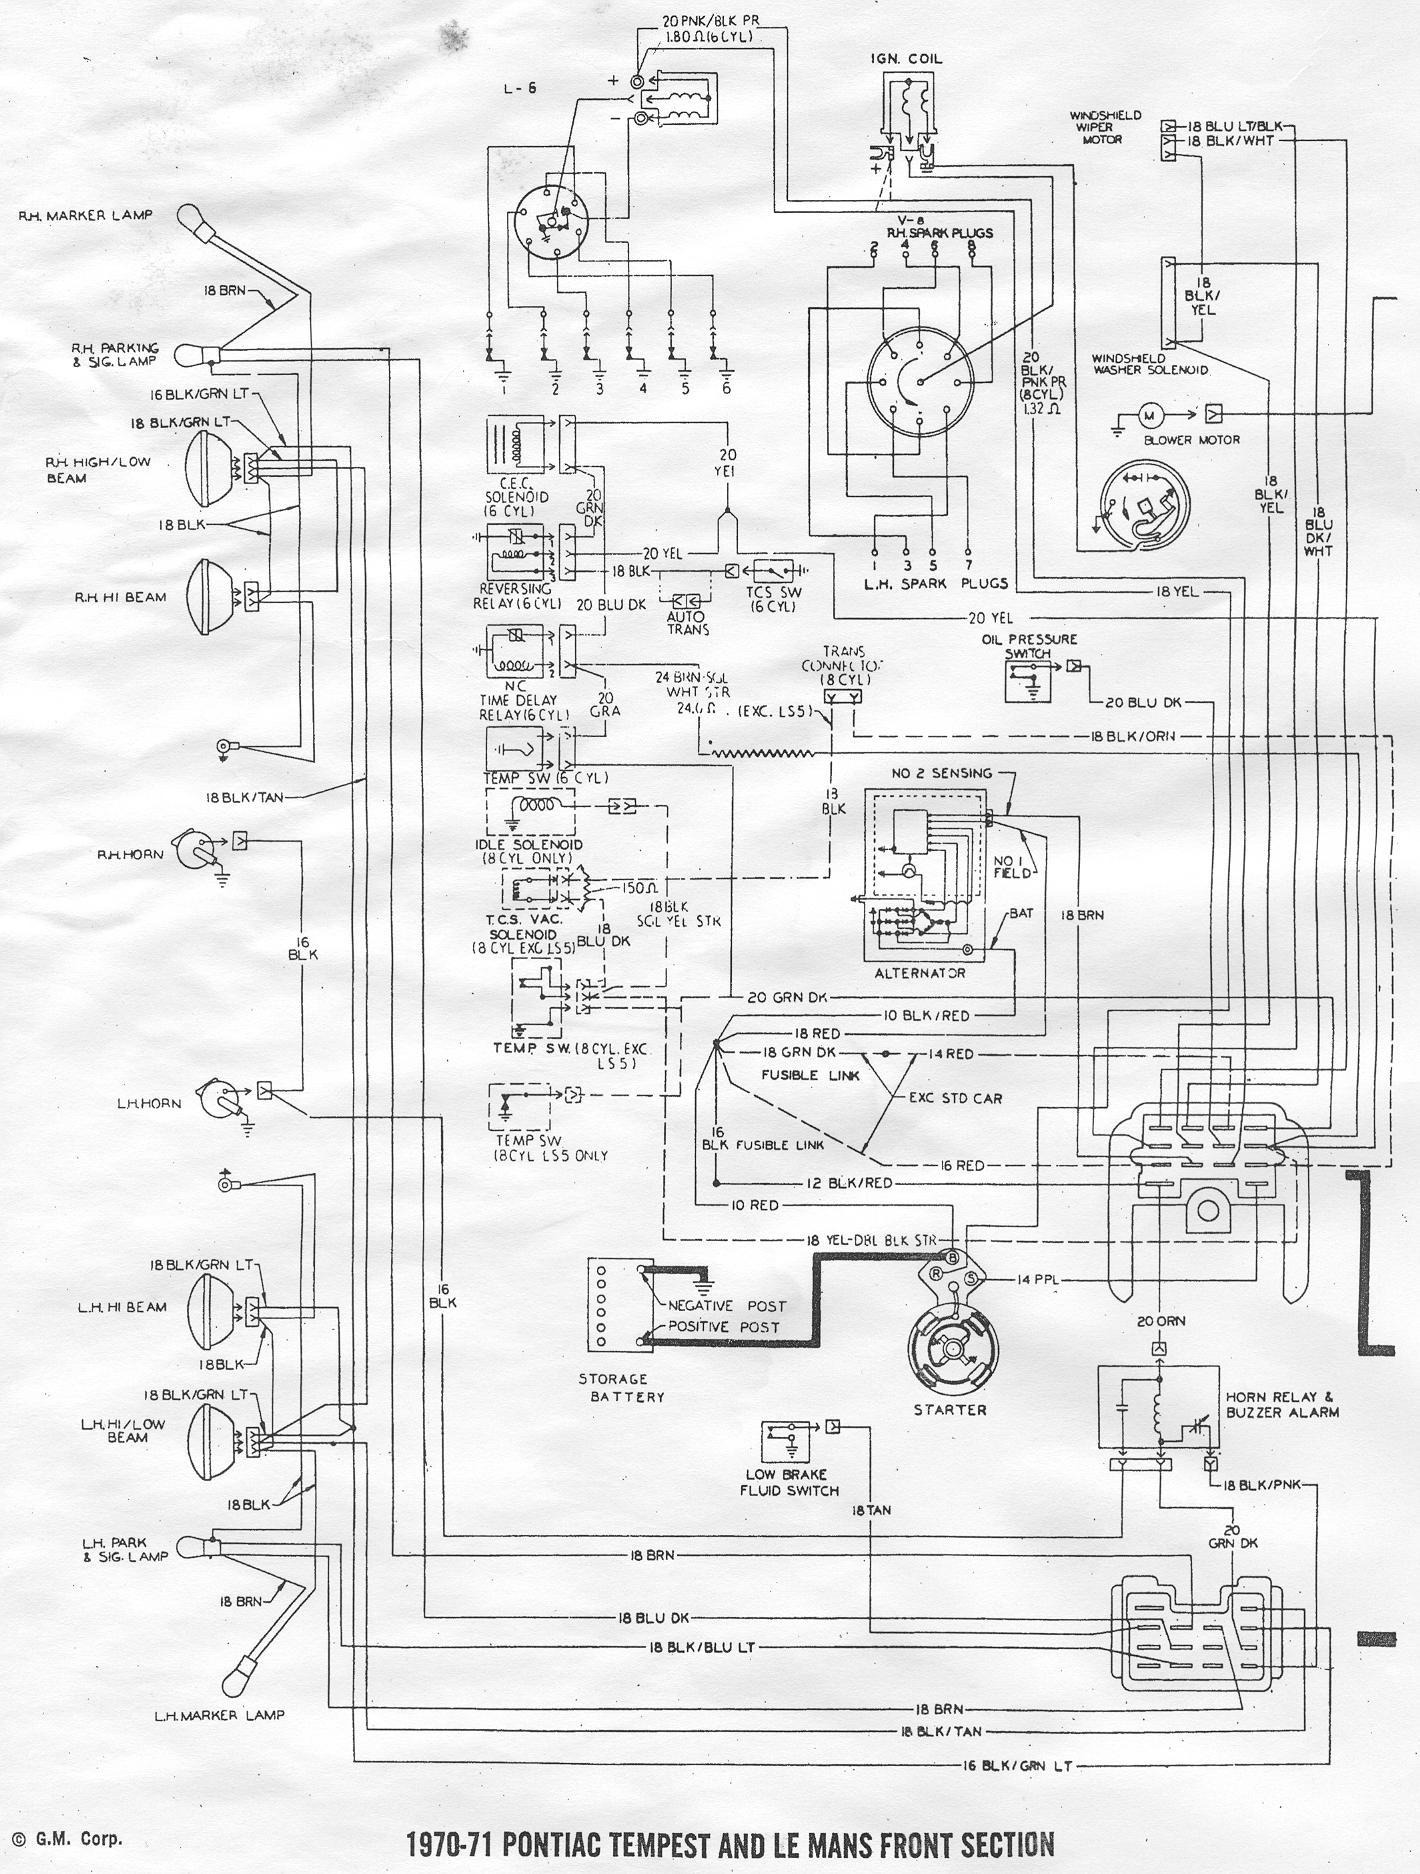 1972 chevelle horn relay wiring diagram 1972 wiring diagrams 1968 chevelle horn relay diagram jodebal com